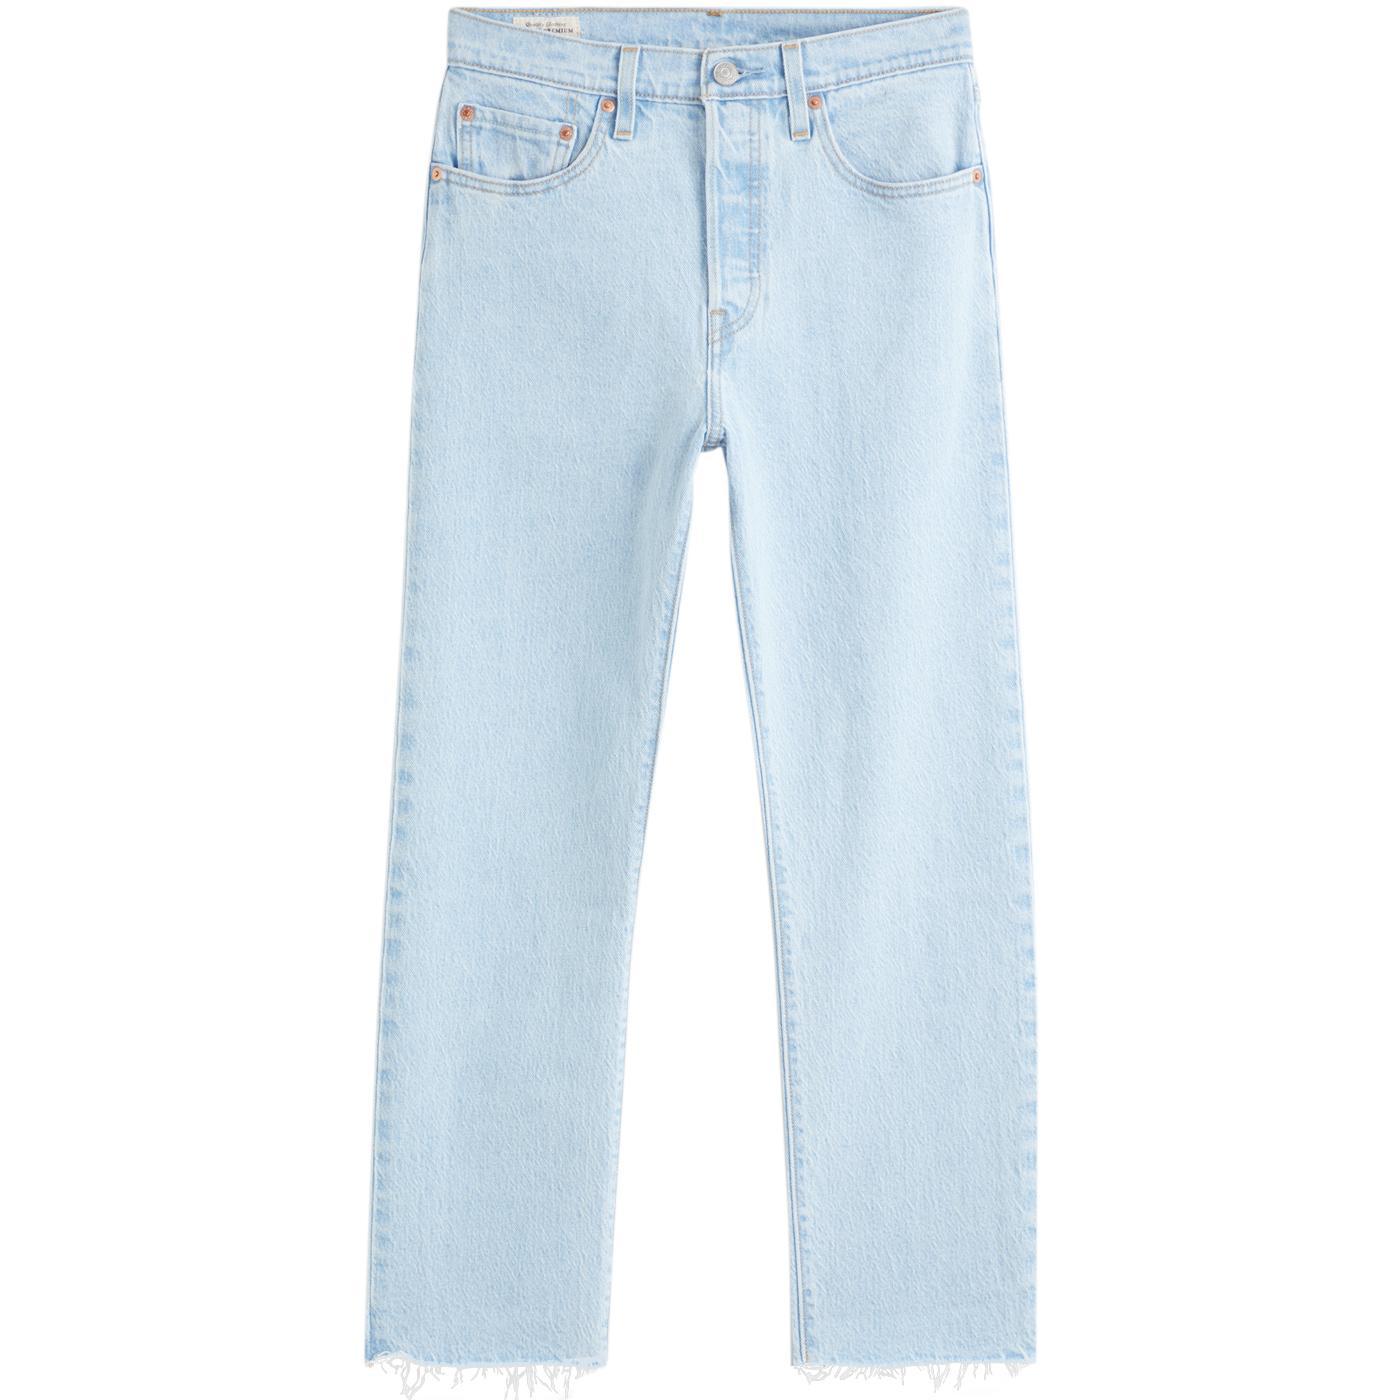 LEVI'S 501 Cropped Retro Jeans (Samba Goal)